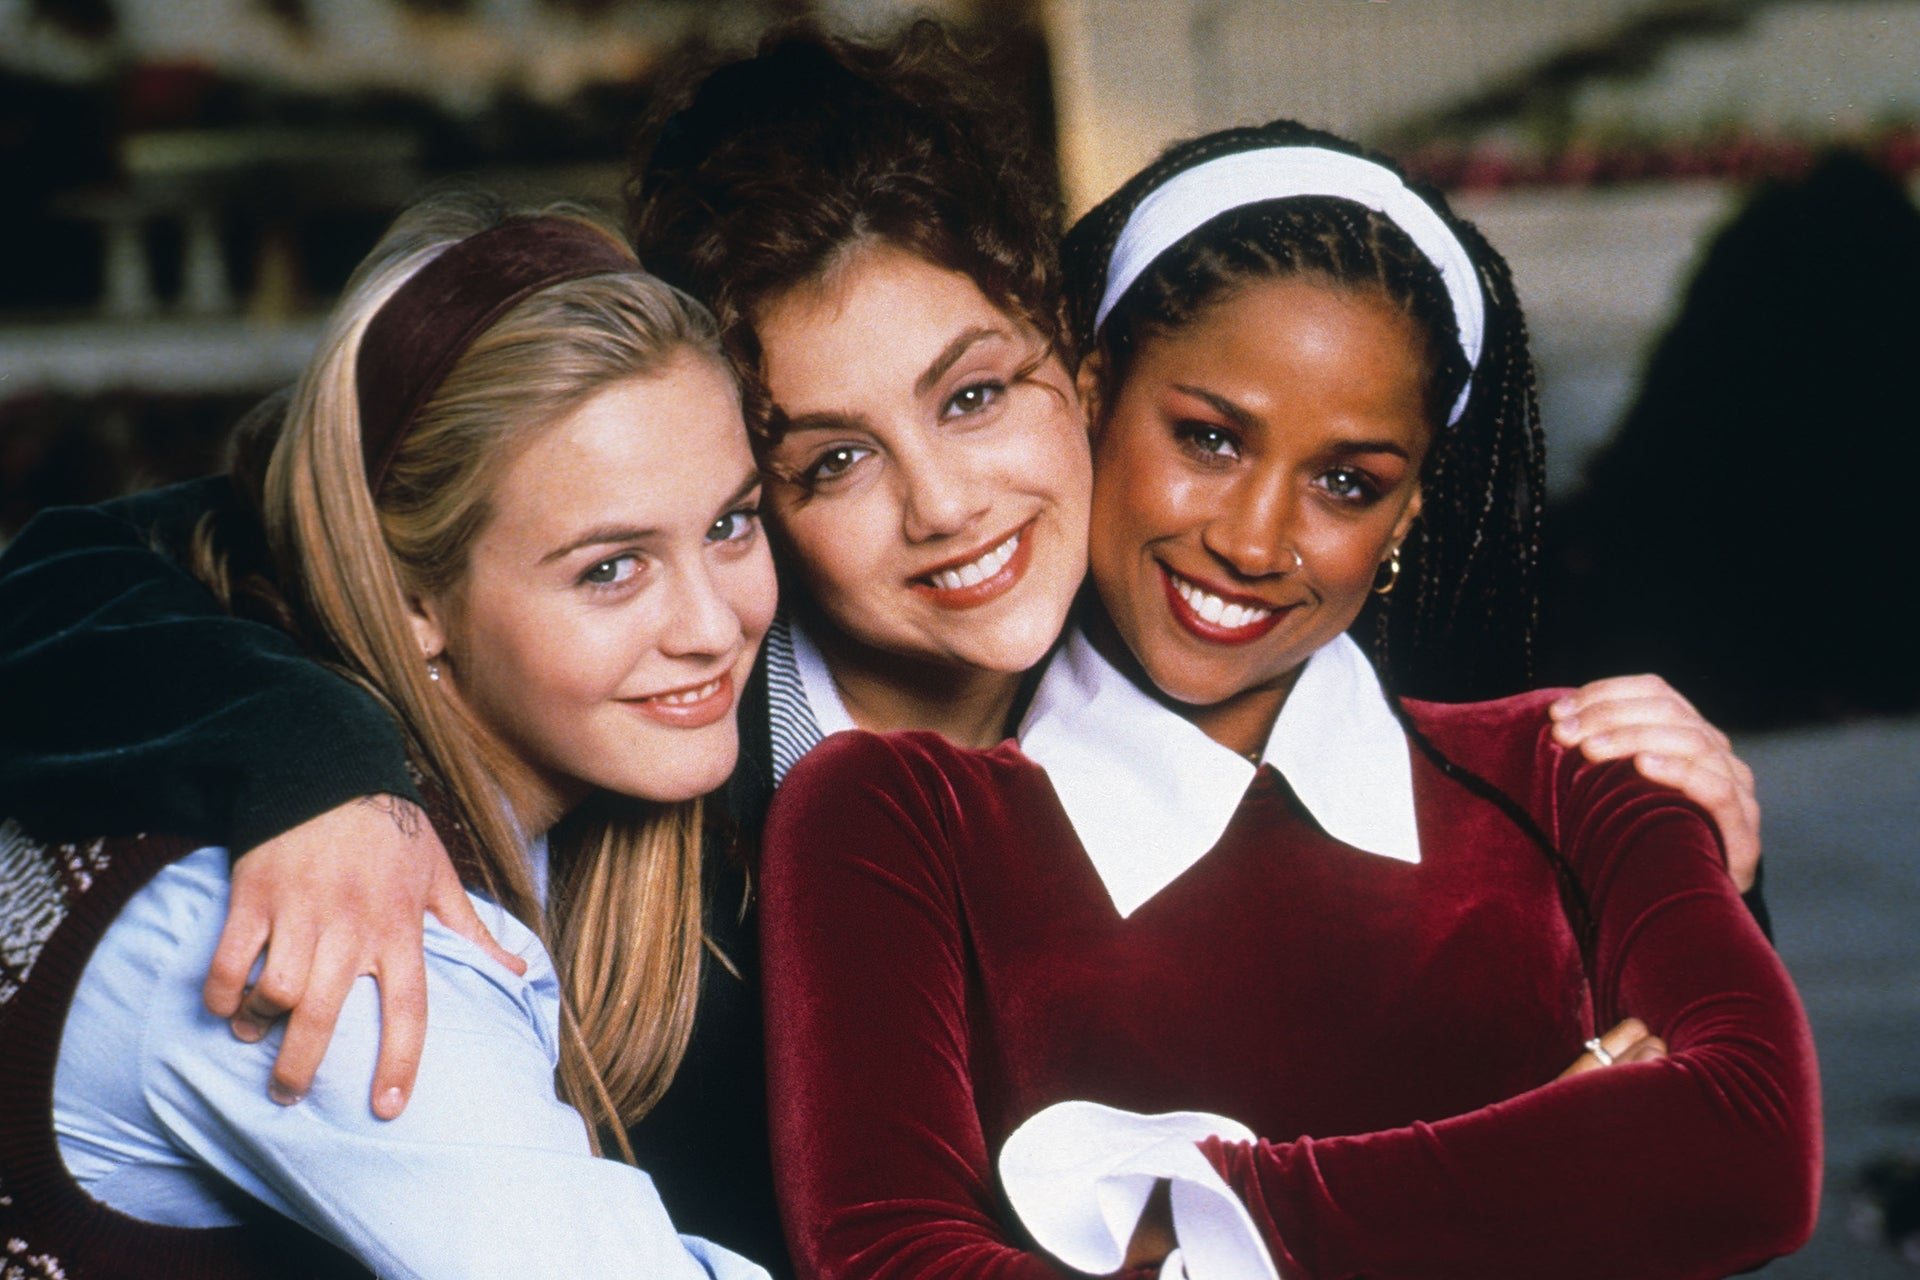 Alicia Silverstone, Brittany Murphy, Stacey Dash, 1995 Autor: Paramount/Kobal/Shutterstock/REX